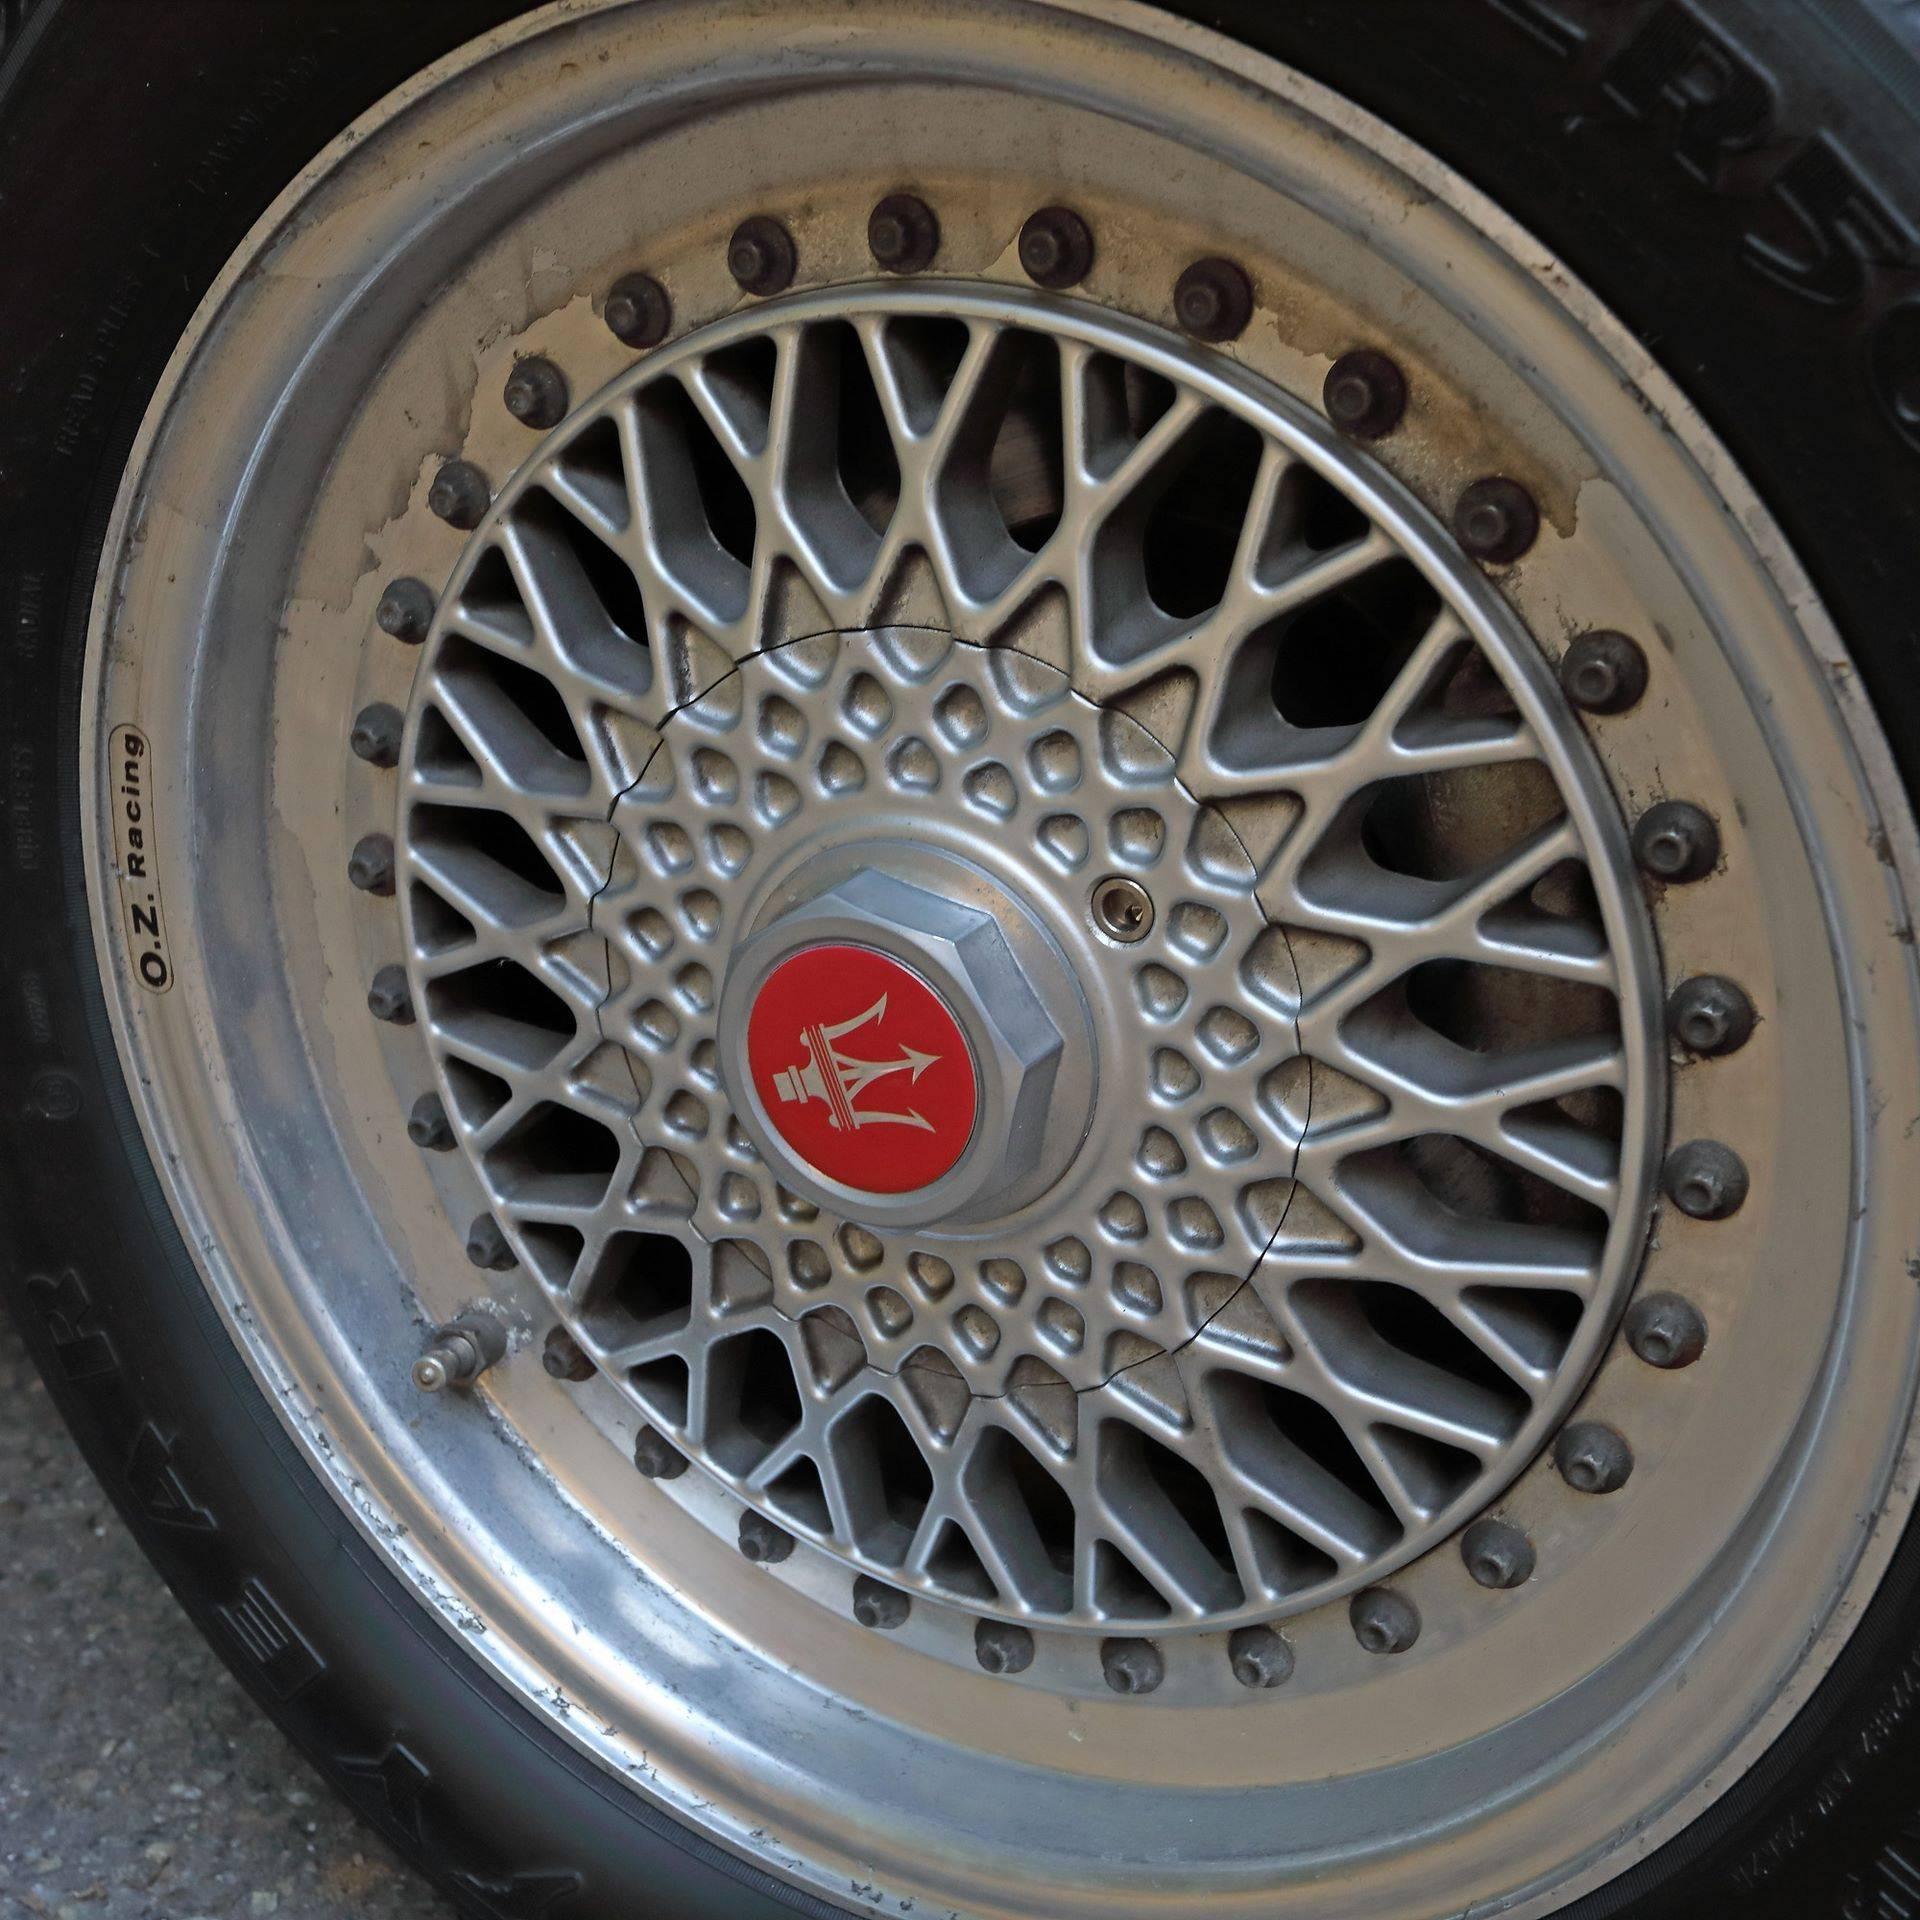 Maserati-Biturbo-Spyder-Elton-John-8